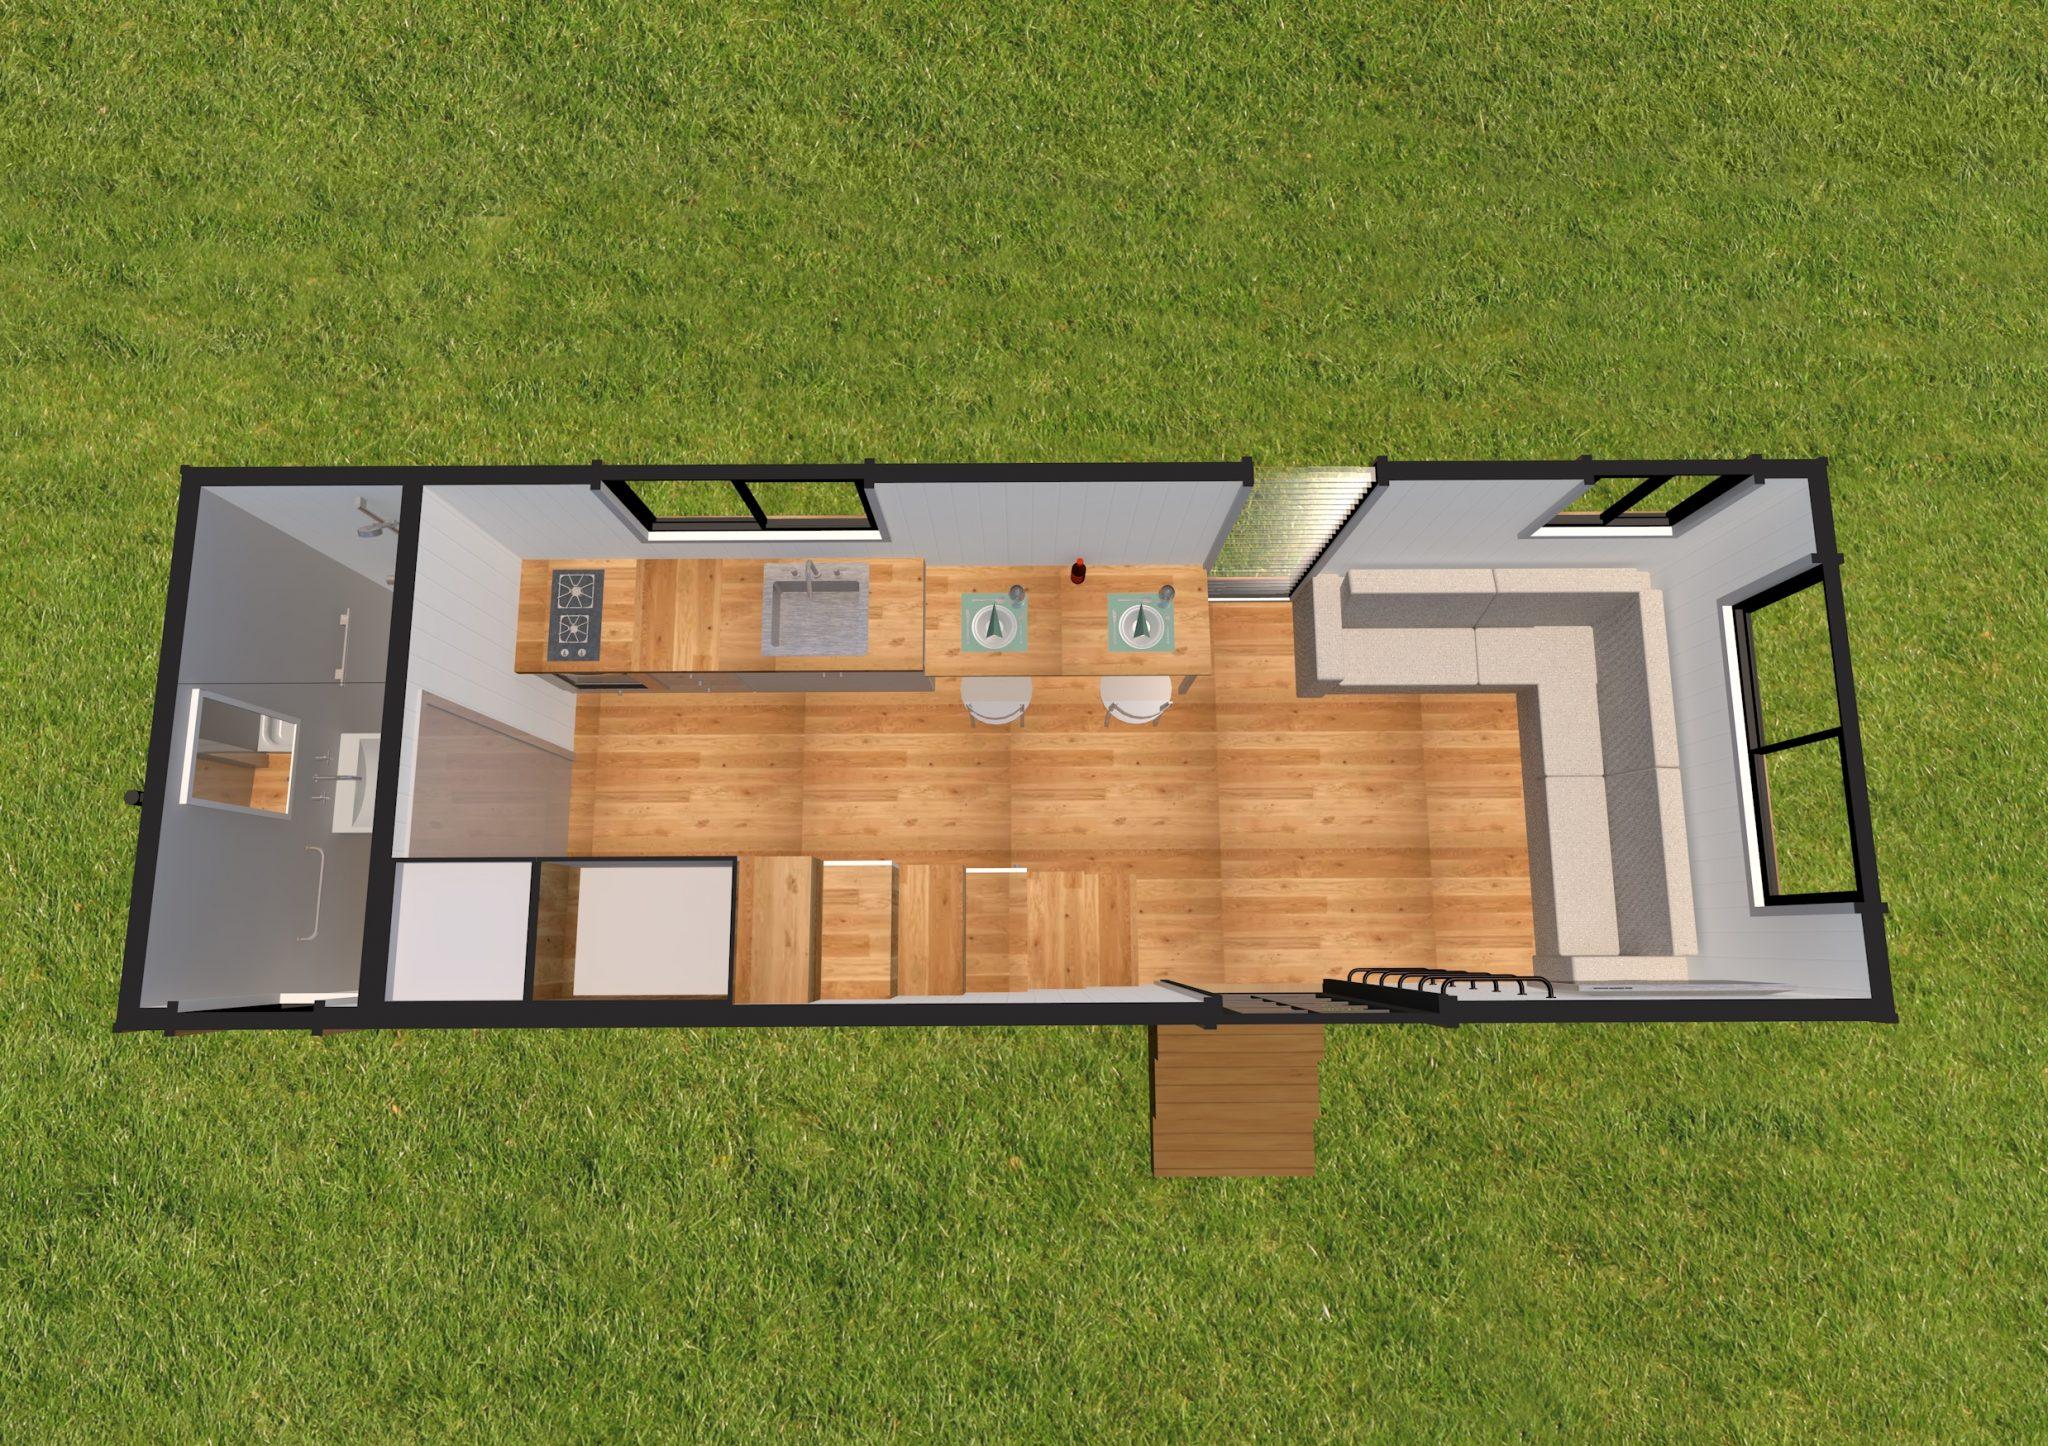 Lifestyle Series 7200DL Base Model Ground Floor